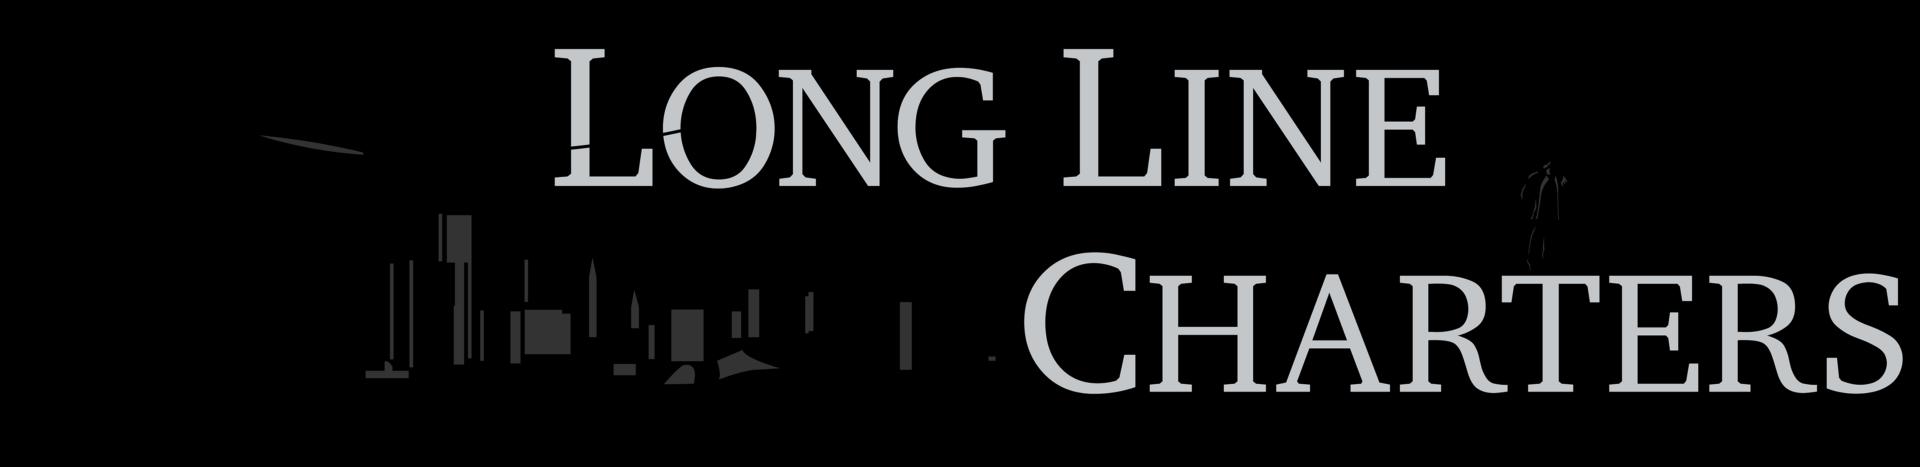 Long Line Charters